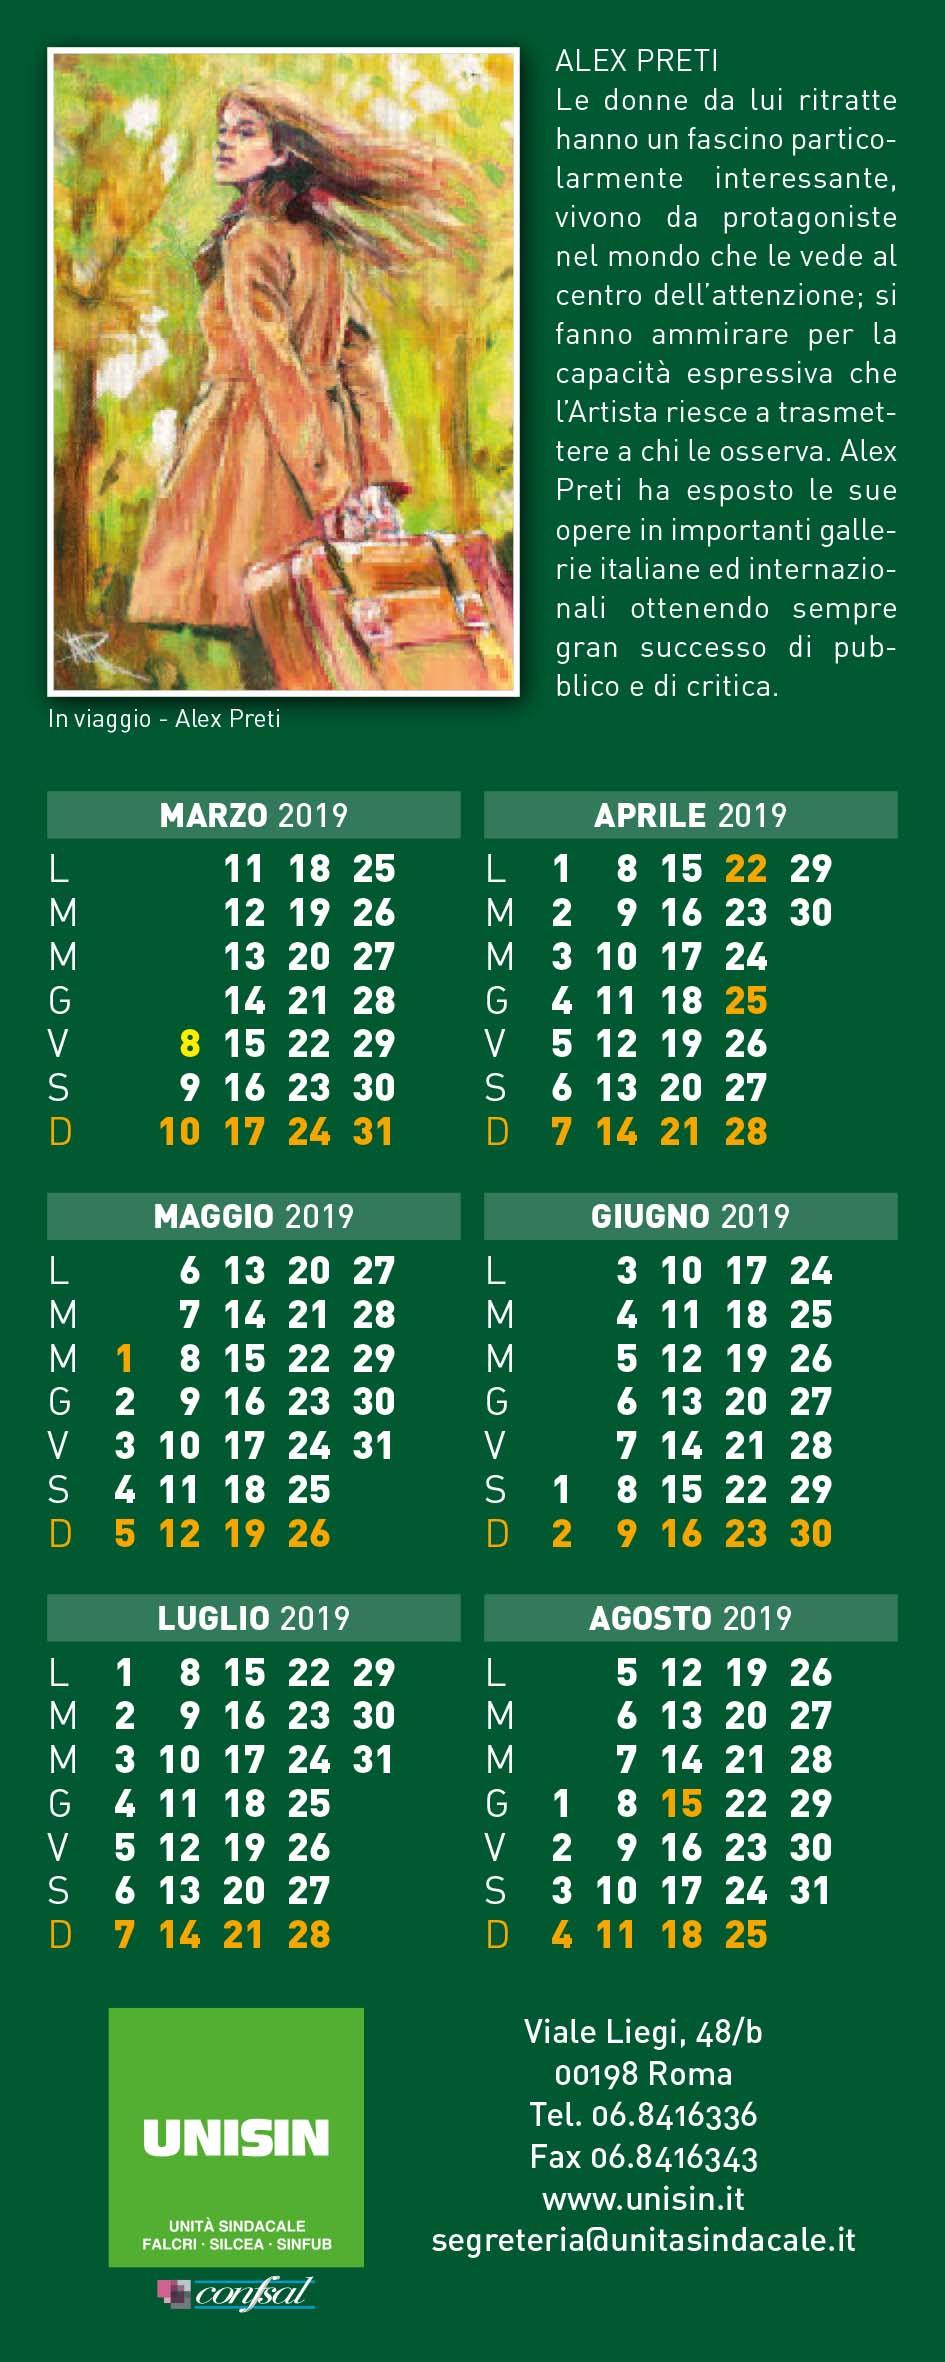 Calendario 2020 Donne.8 Marzo 2019 8 Marzo 2020 Unisin Unita Sindacale